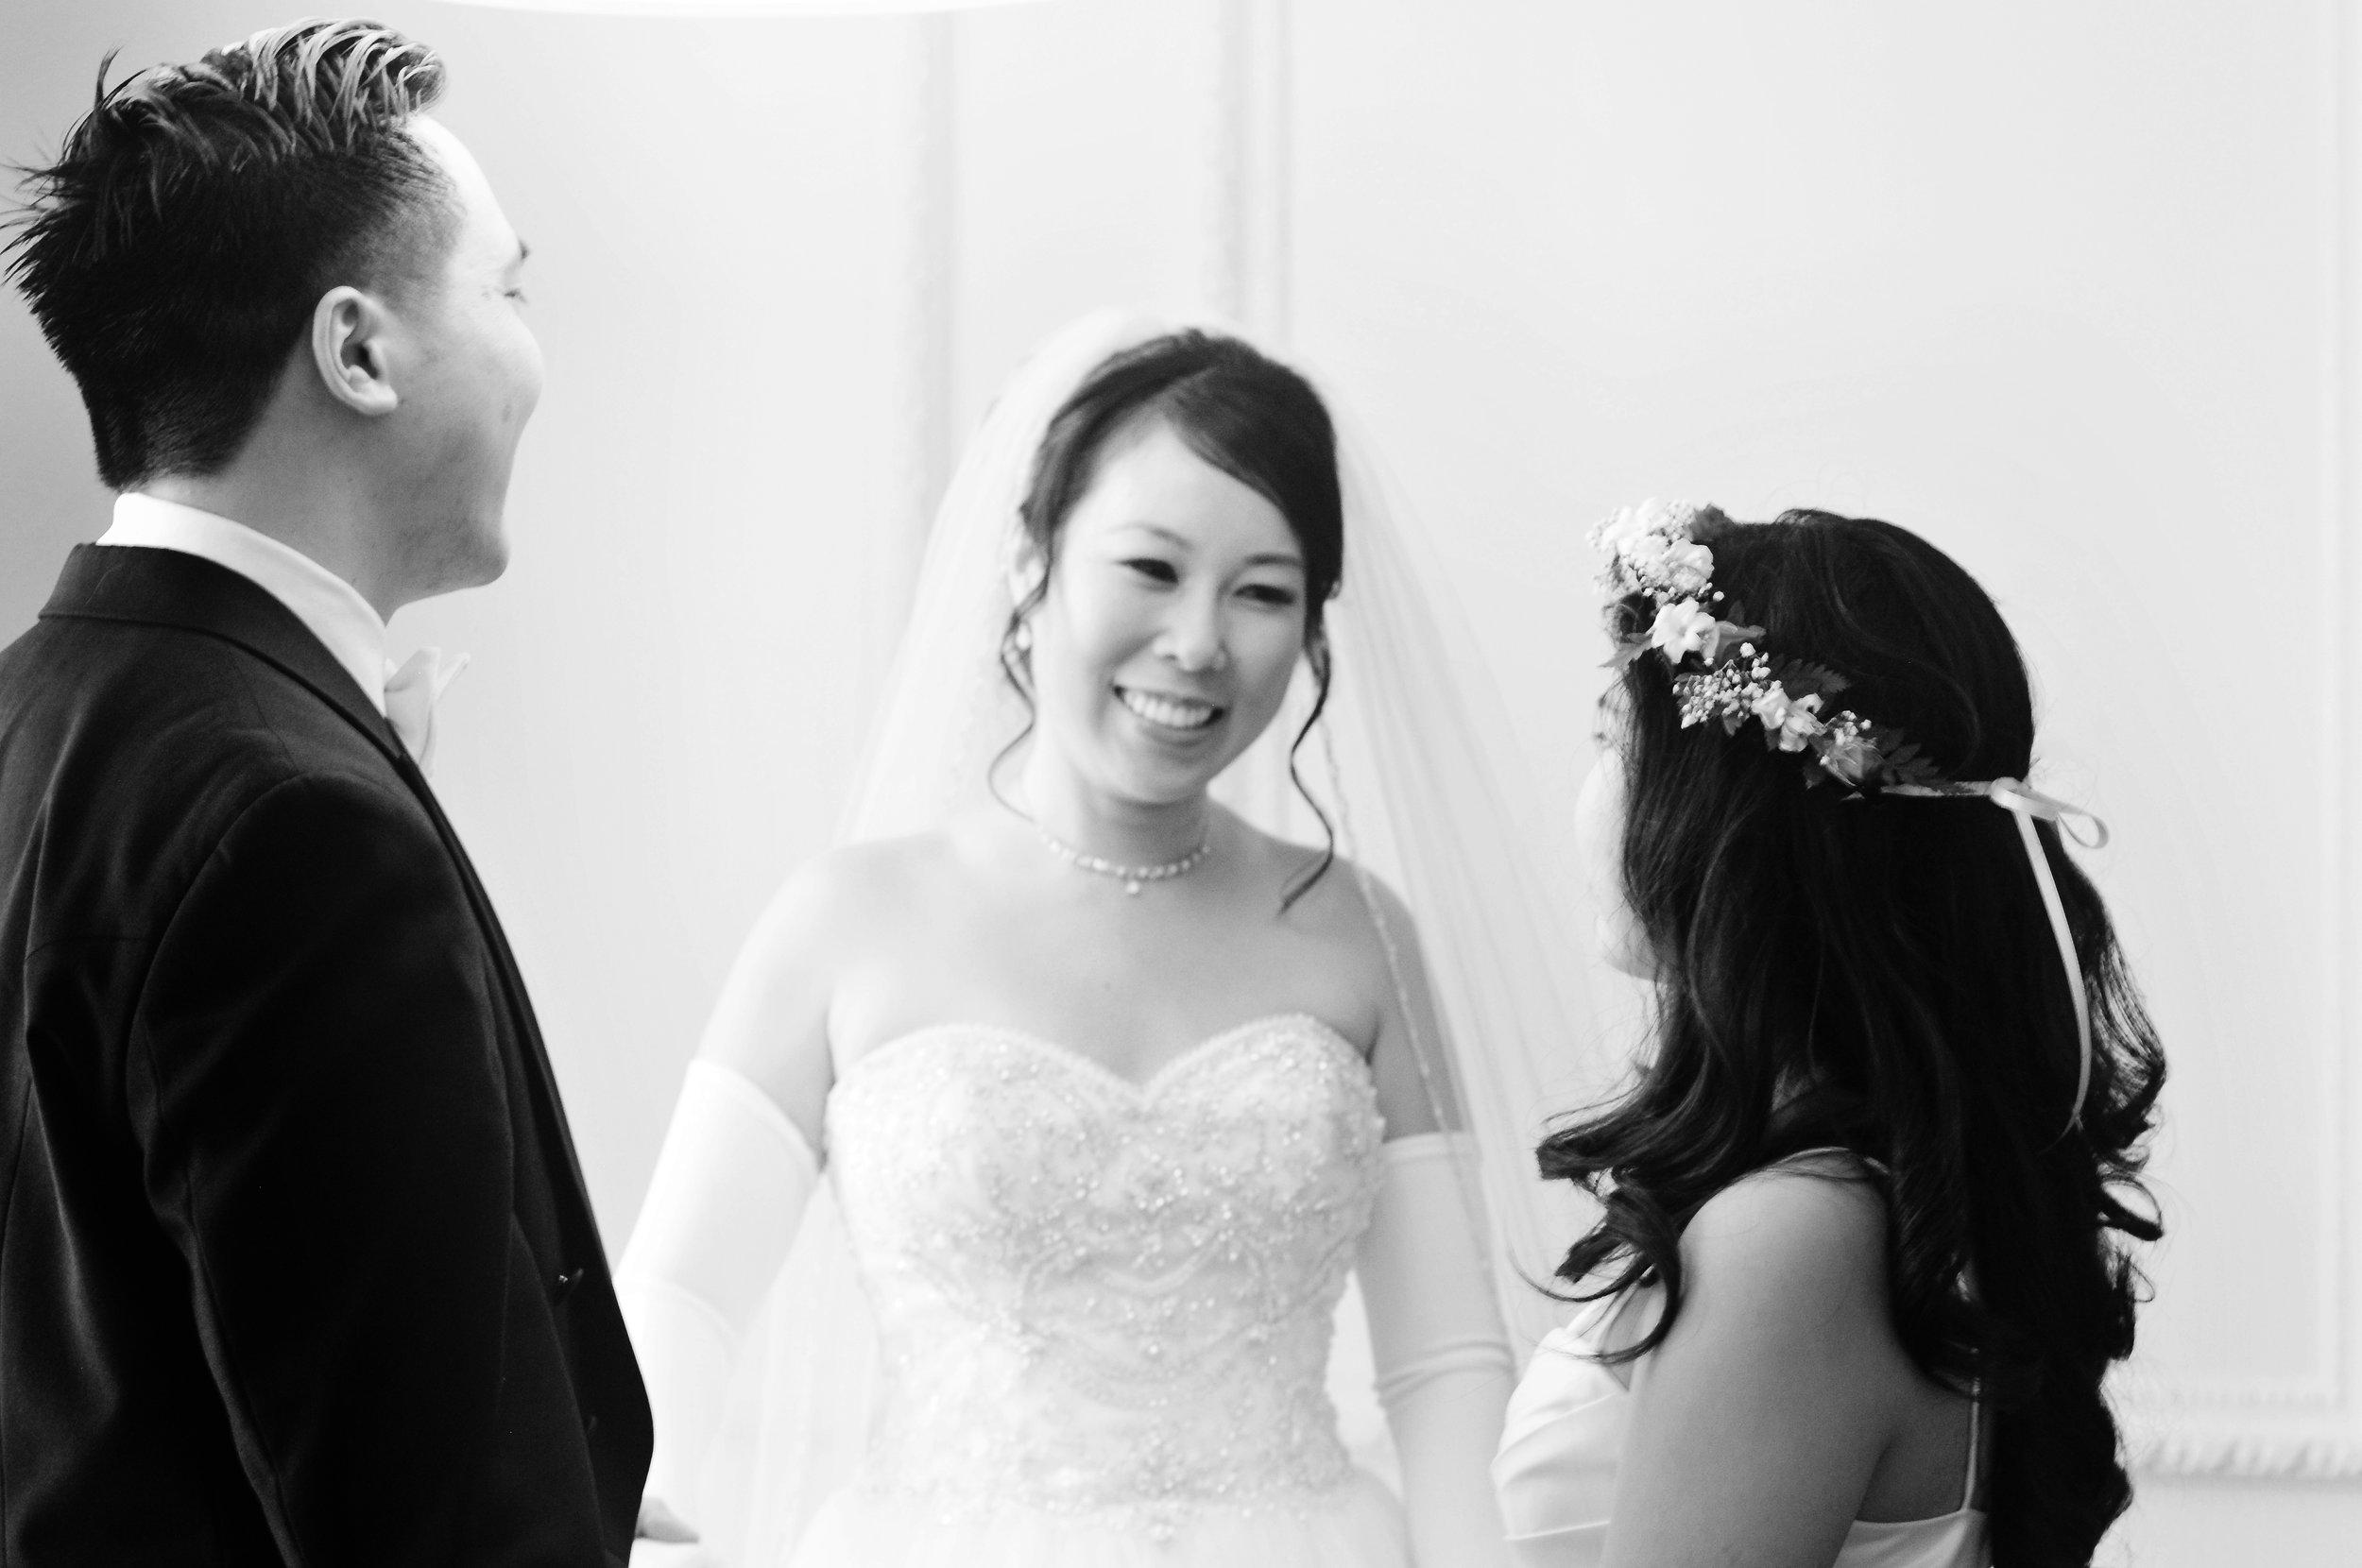 Partovi Wedding 2183 by maria pablo.jpg